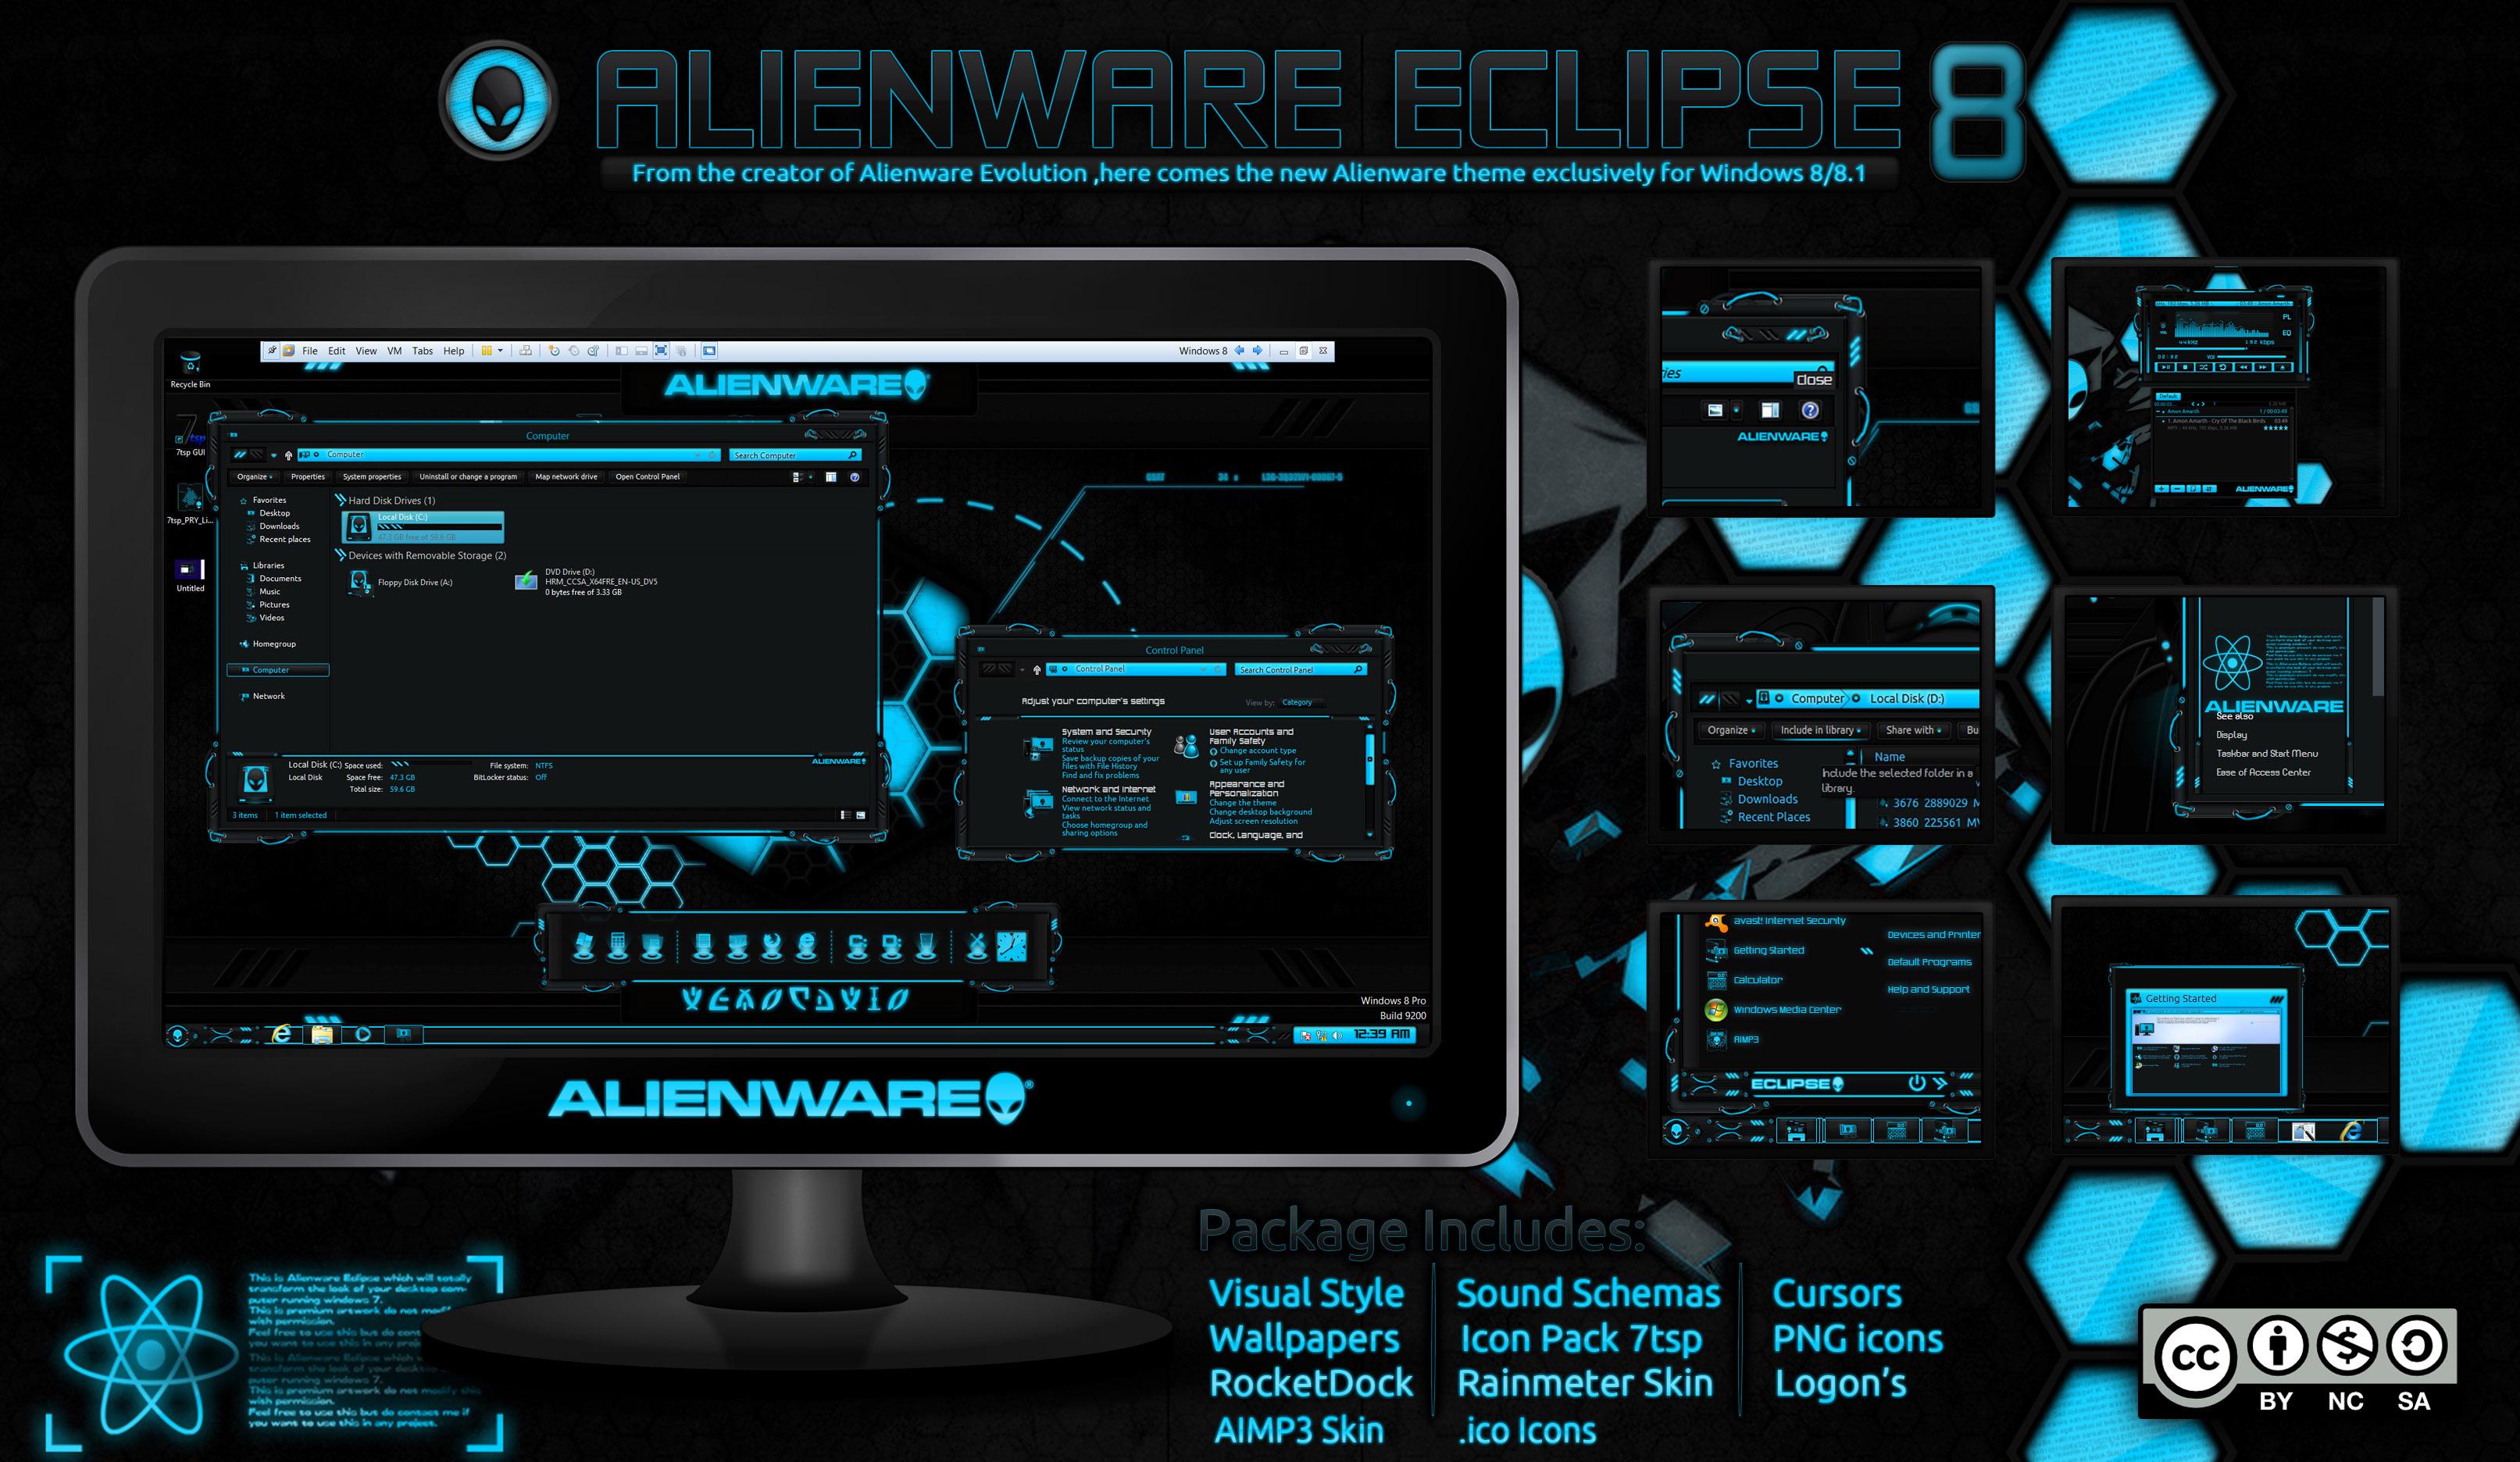 Alienware Eclipse Win 8 8 1 Update 6 28 2015 By Mr Blade